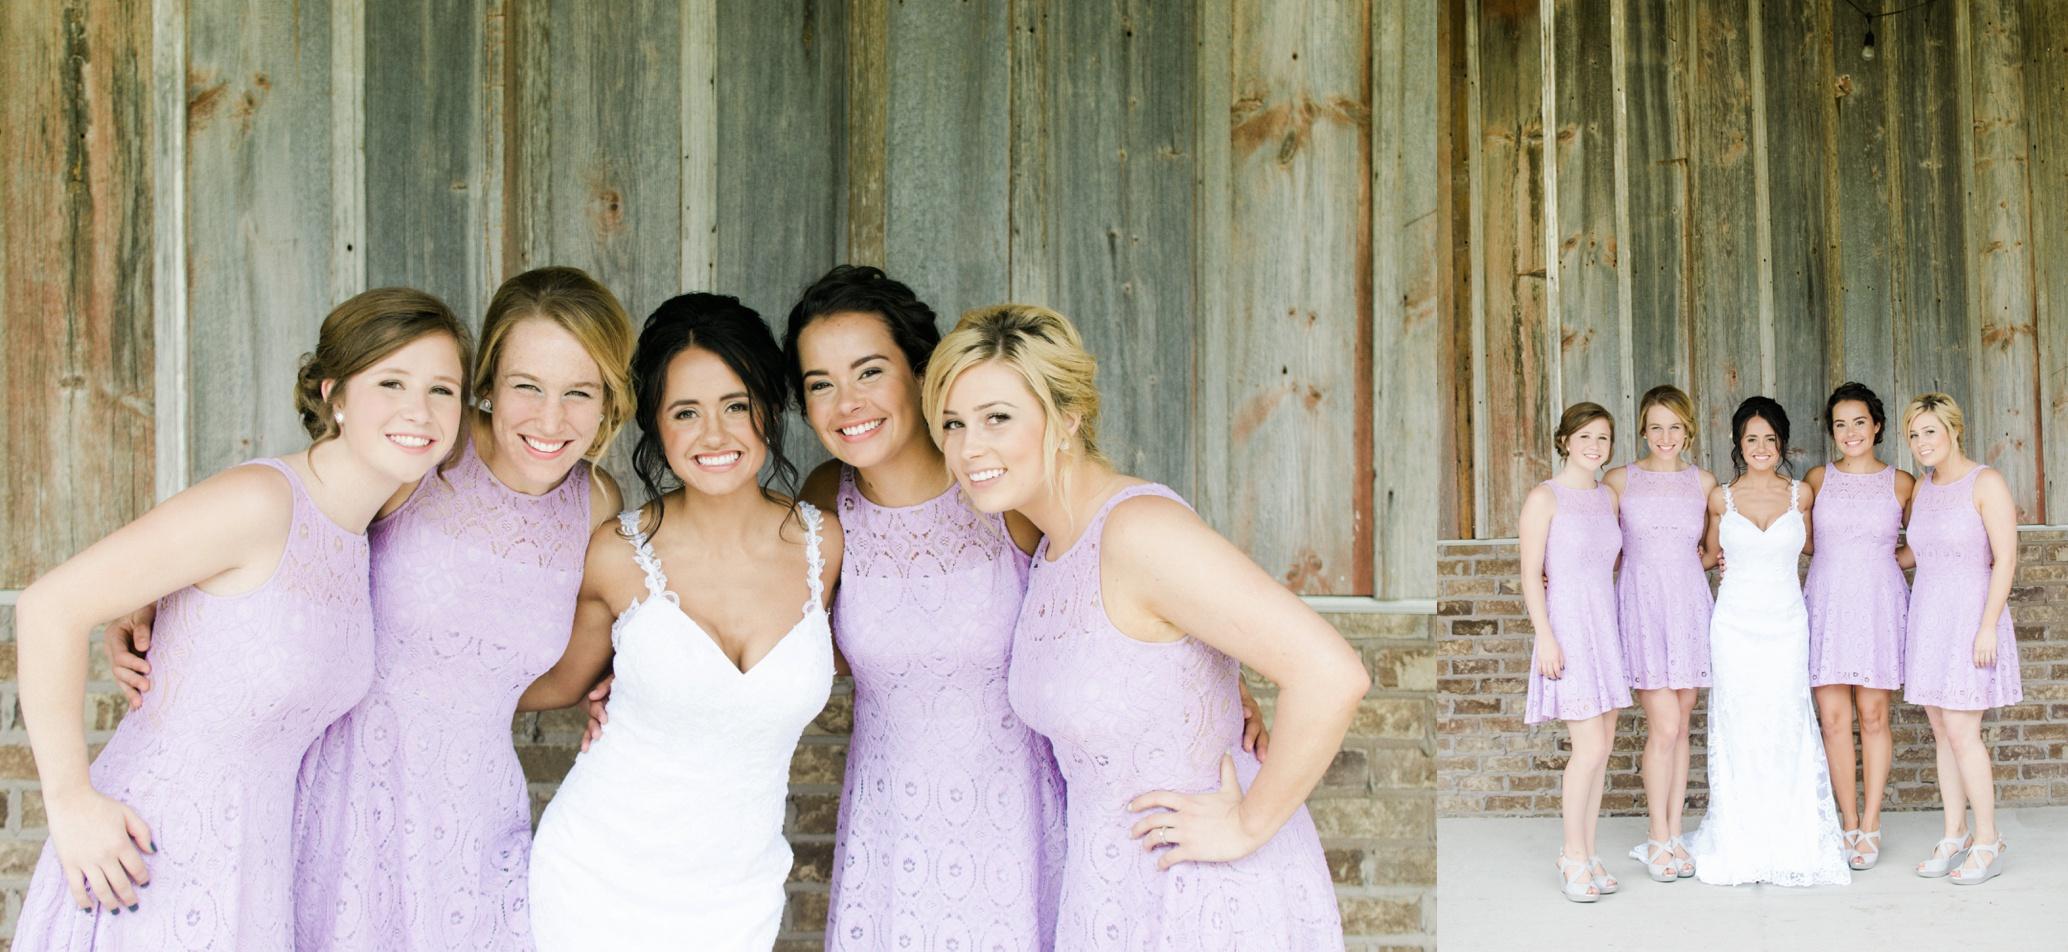 Barnes' Place Rustic Outdoor Wedding | Ali Leigh Photo Minneapolis Wedding Photographer_0102.jpg